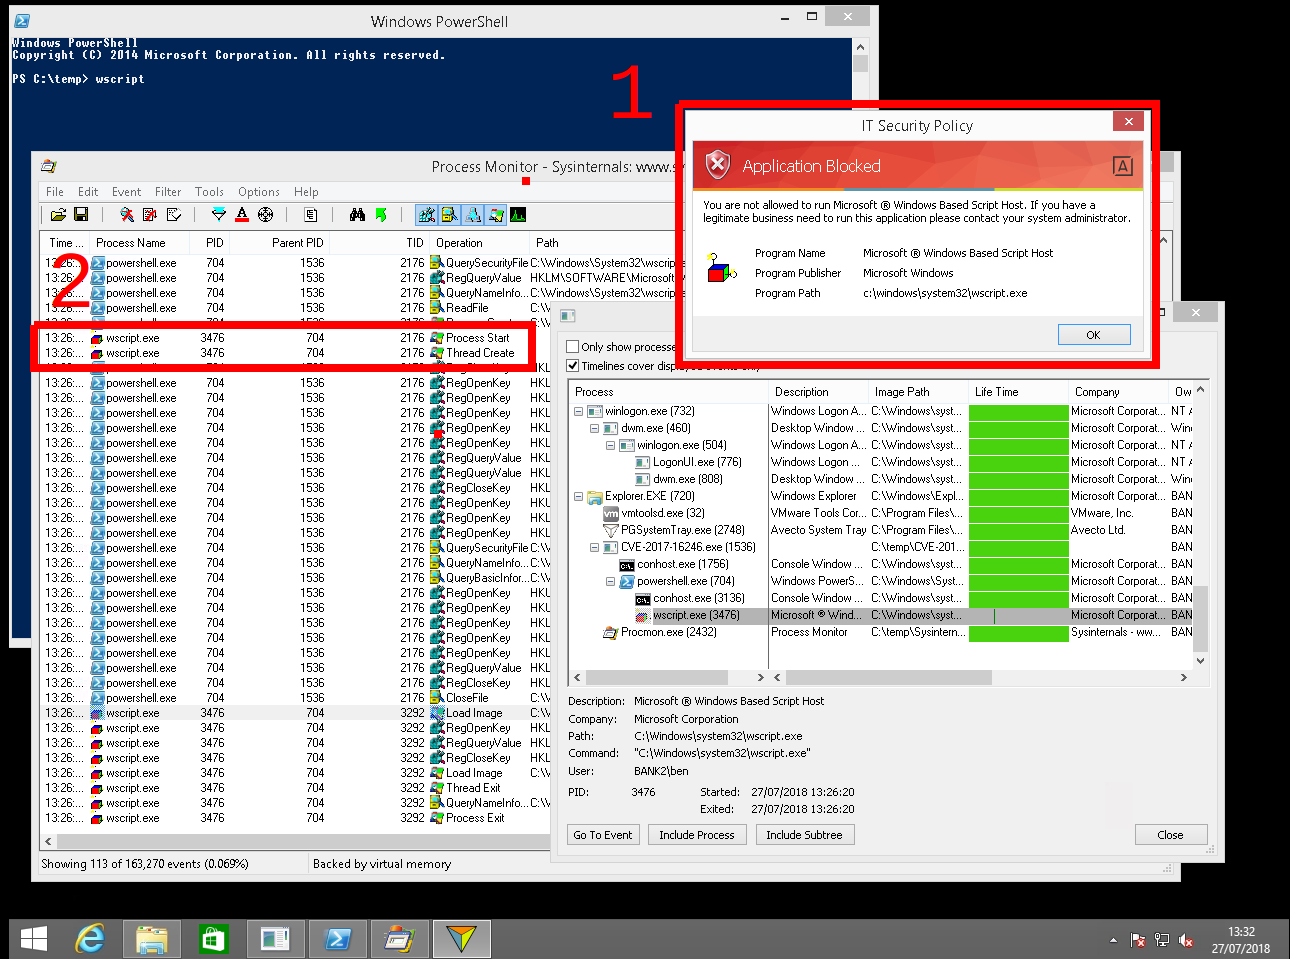 C:\Users\coakley\Desktop\labs.nettitude.com\Blogs\2018\Avecto\Pictures\Avecto_WscriptBlocked_A.png